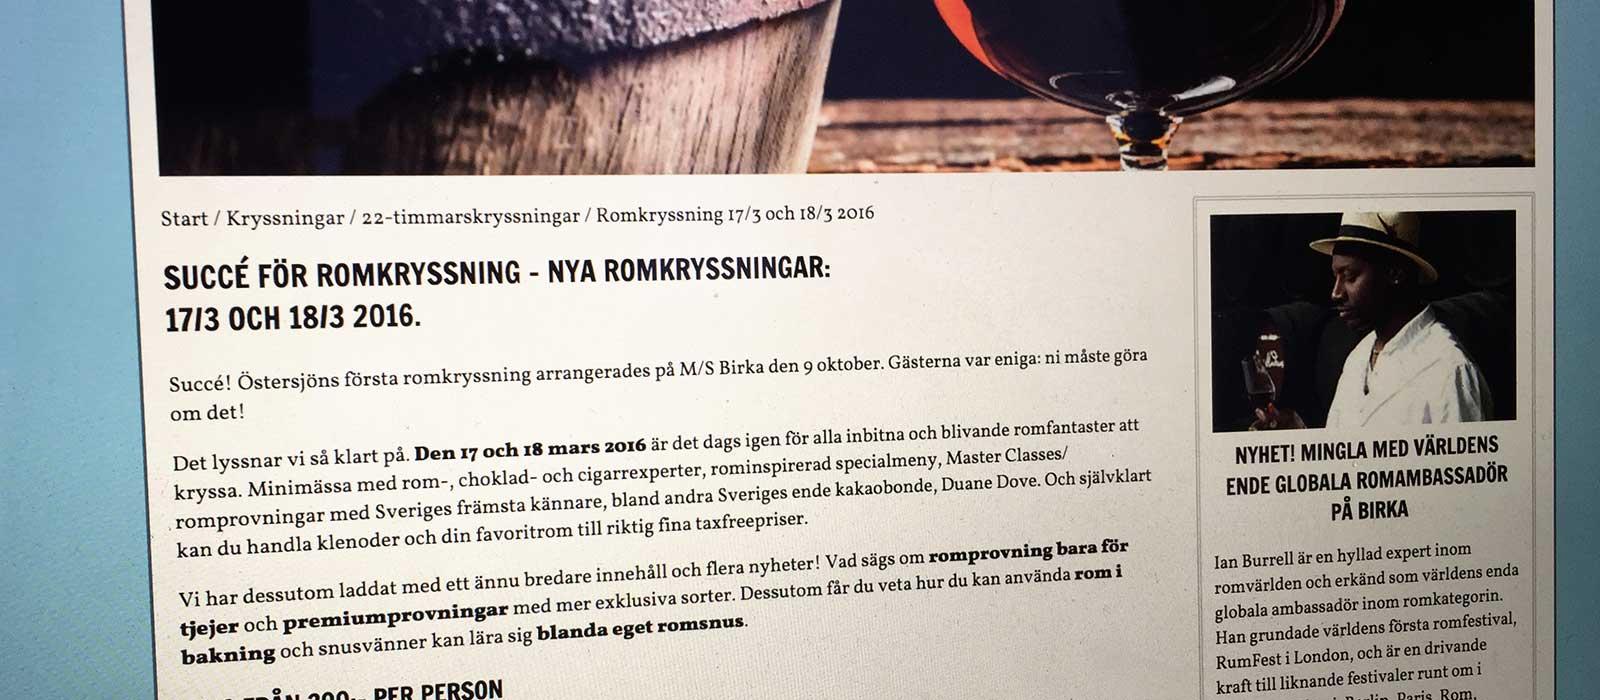 birka-romkryssning-2016-large